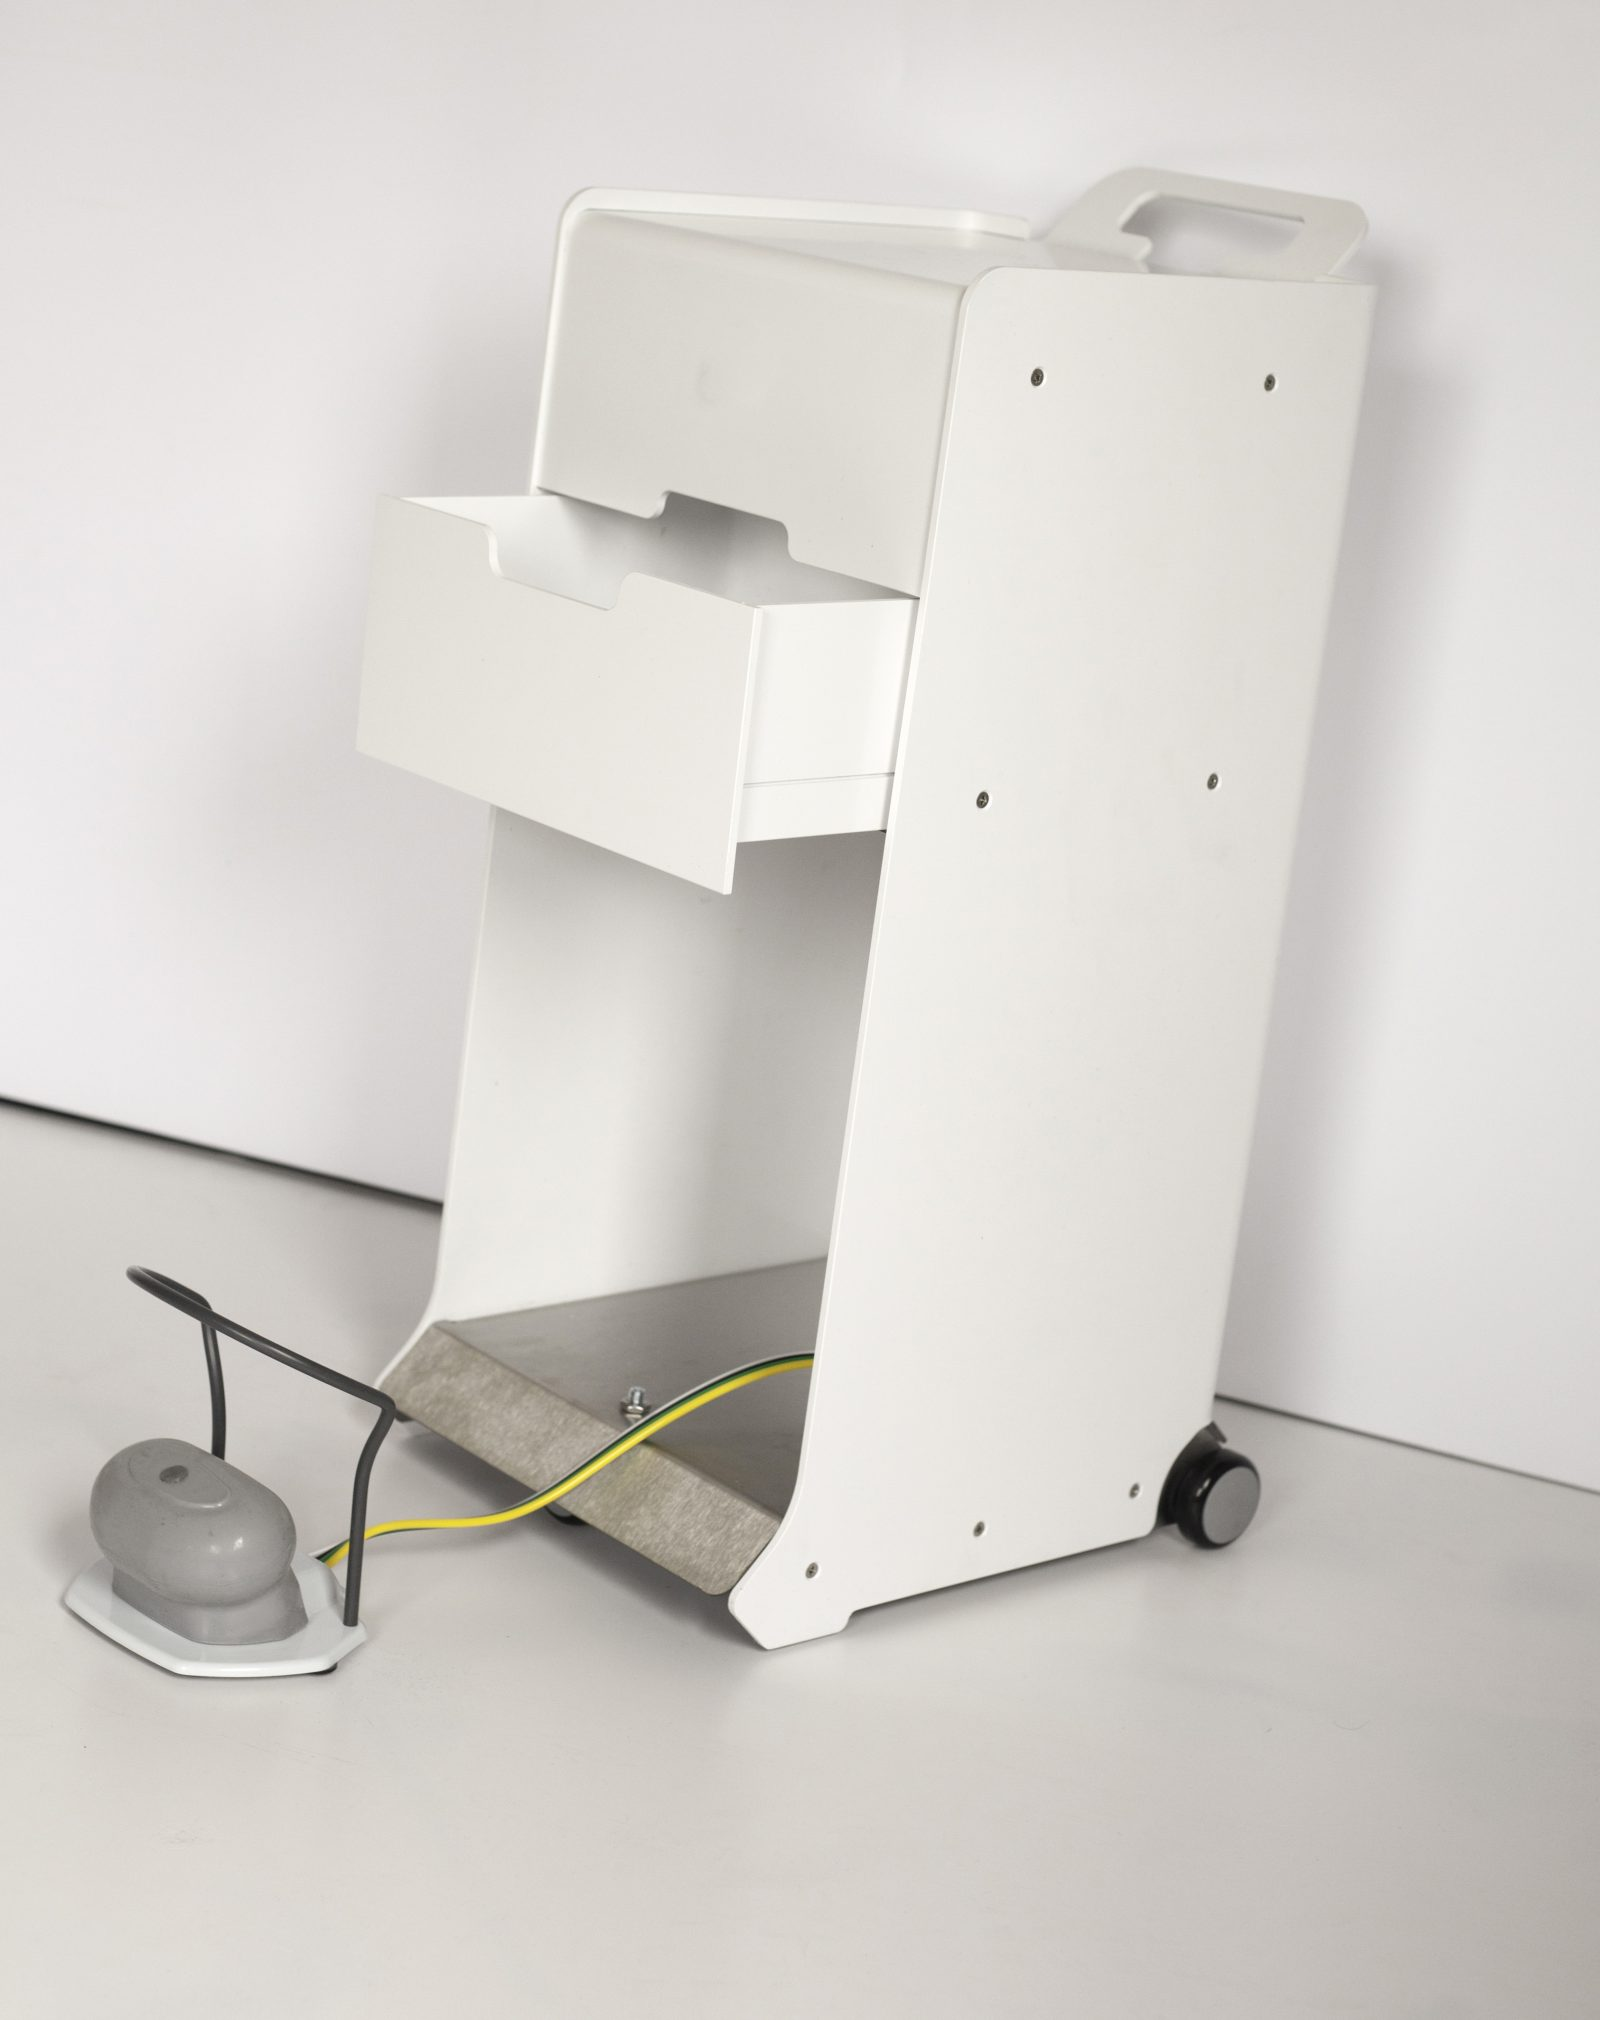 img_2396-without-dryair